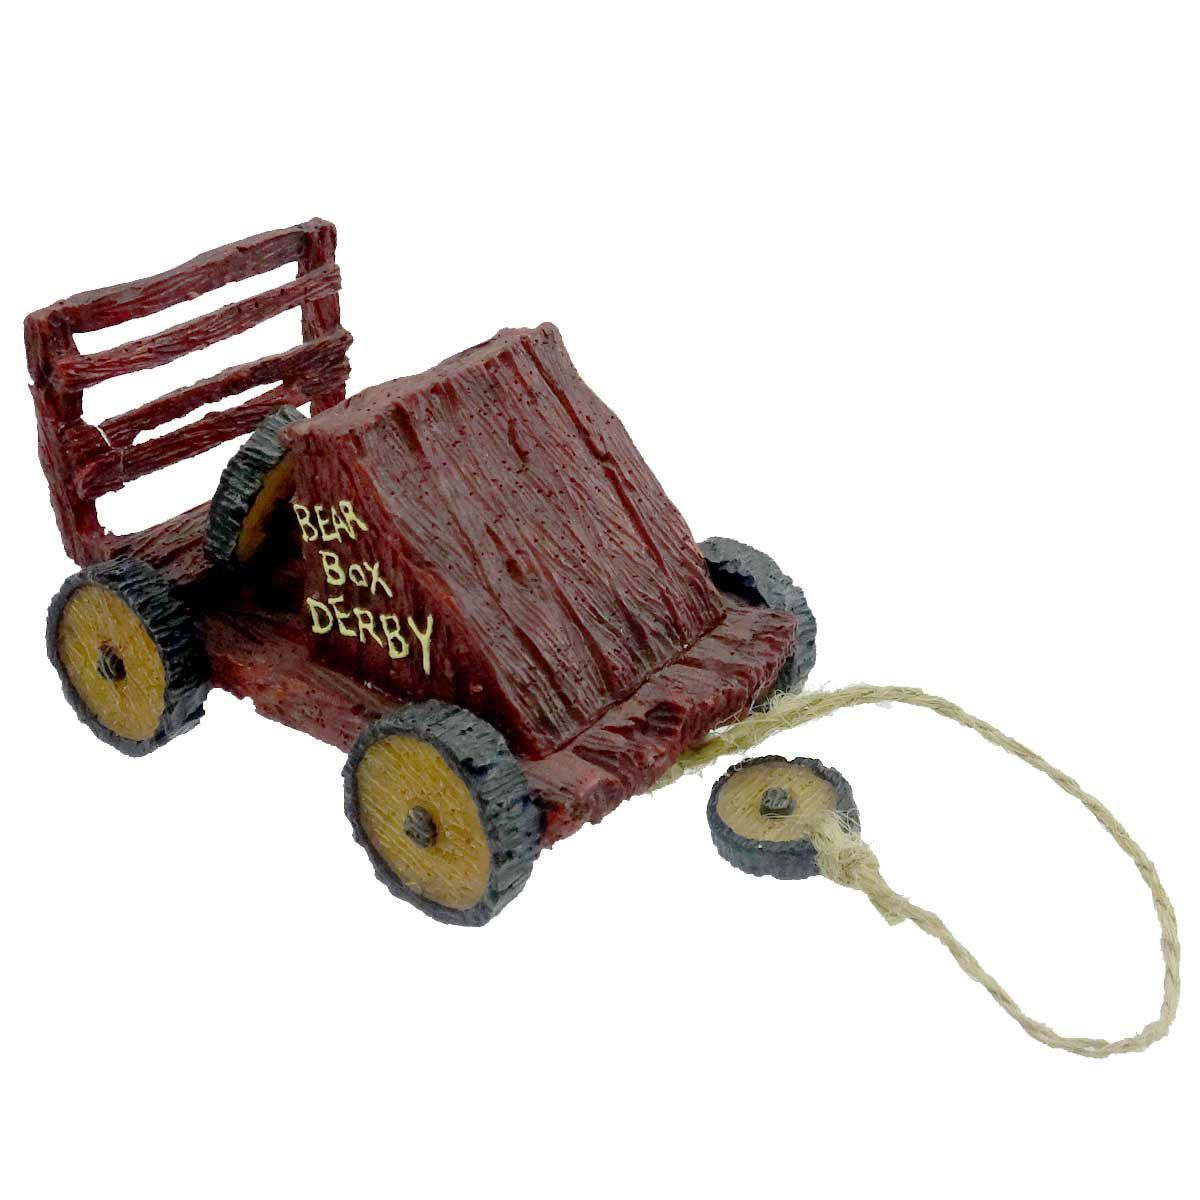 Bearbox Derby Tug Along Figurine